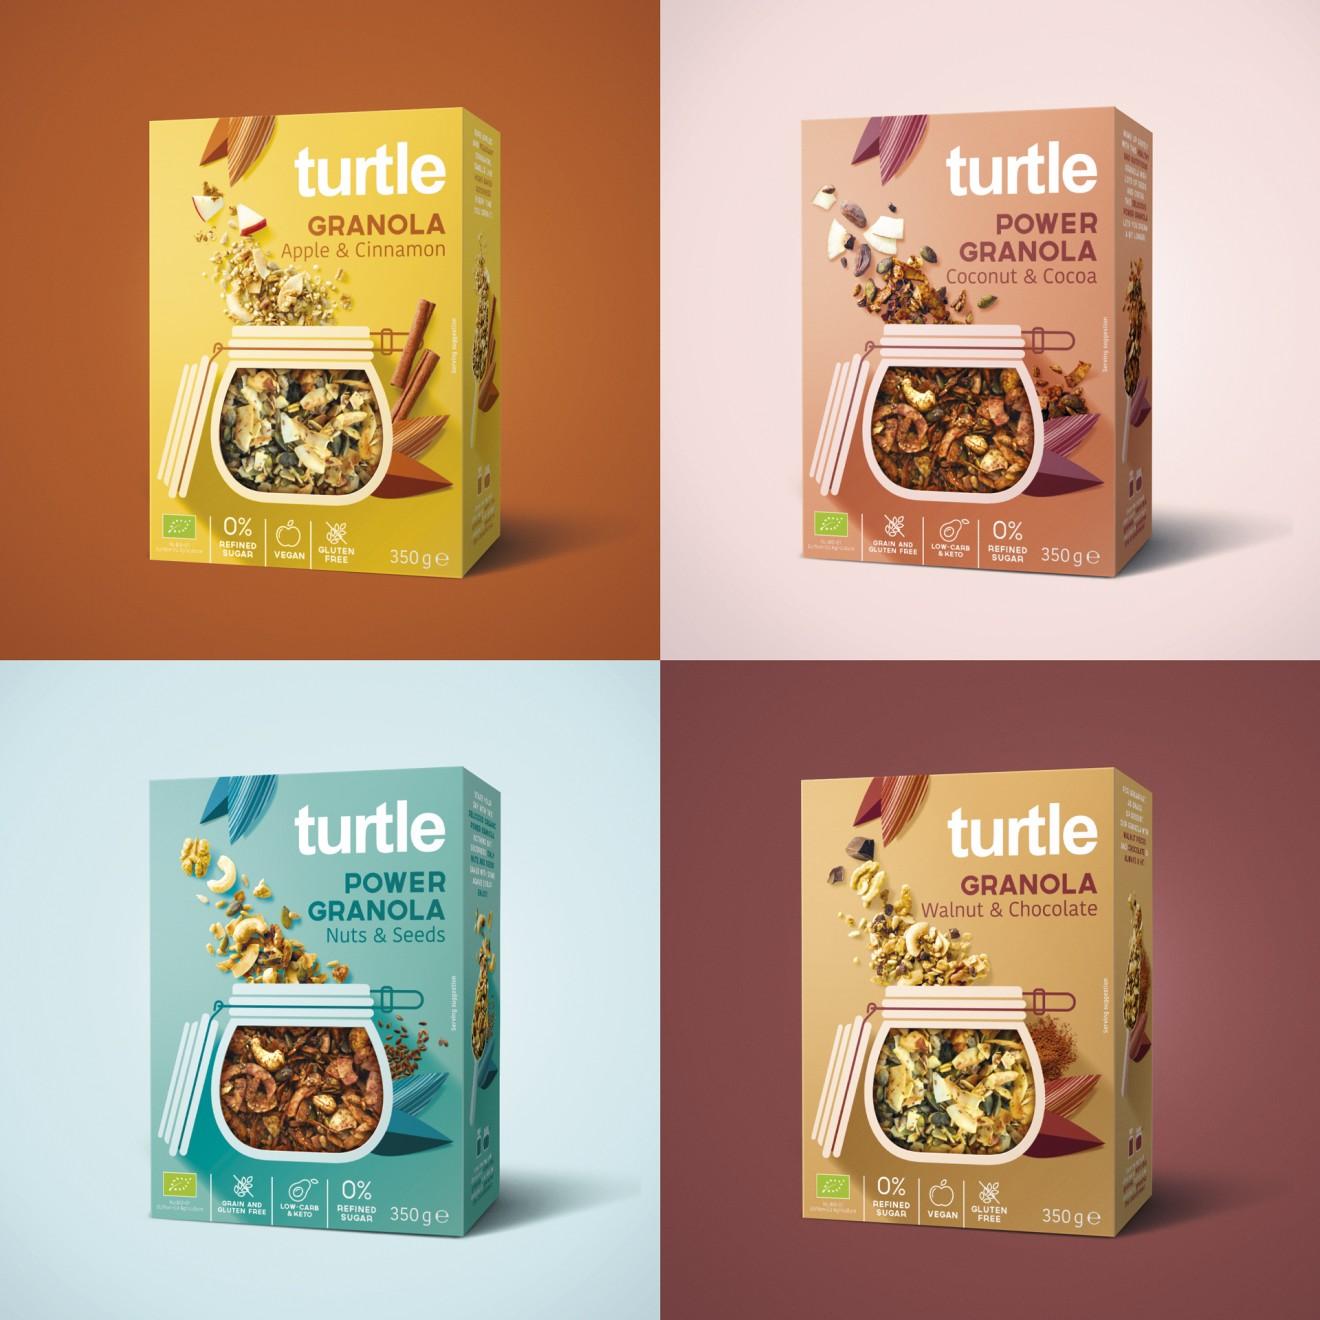 Quatre Mains package design - turtle, award